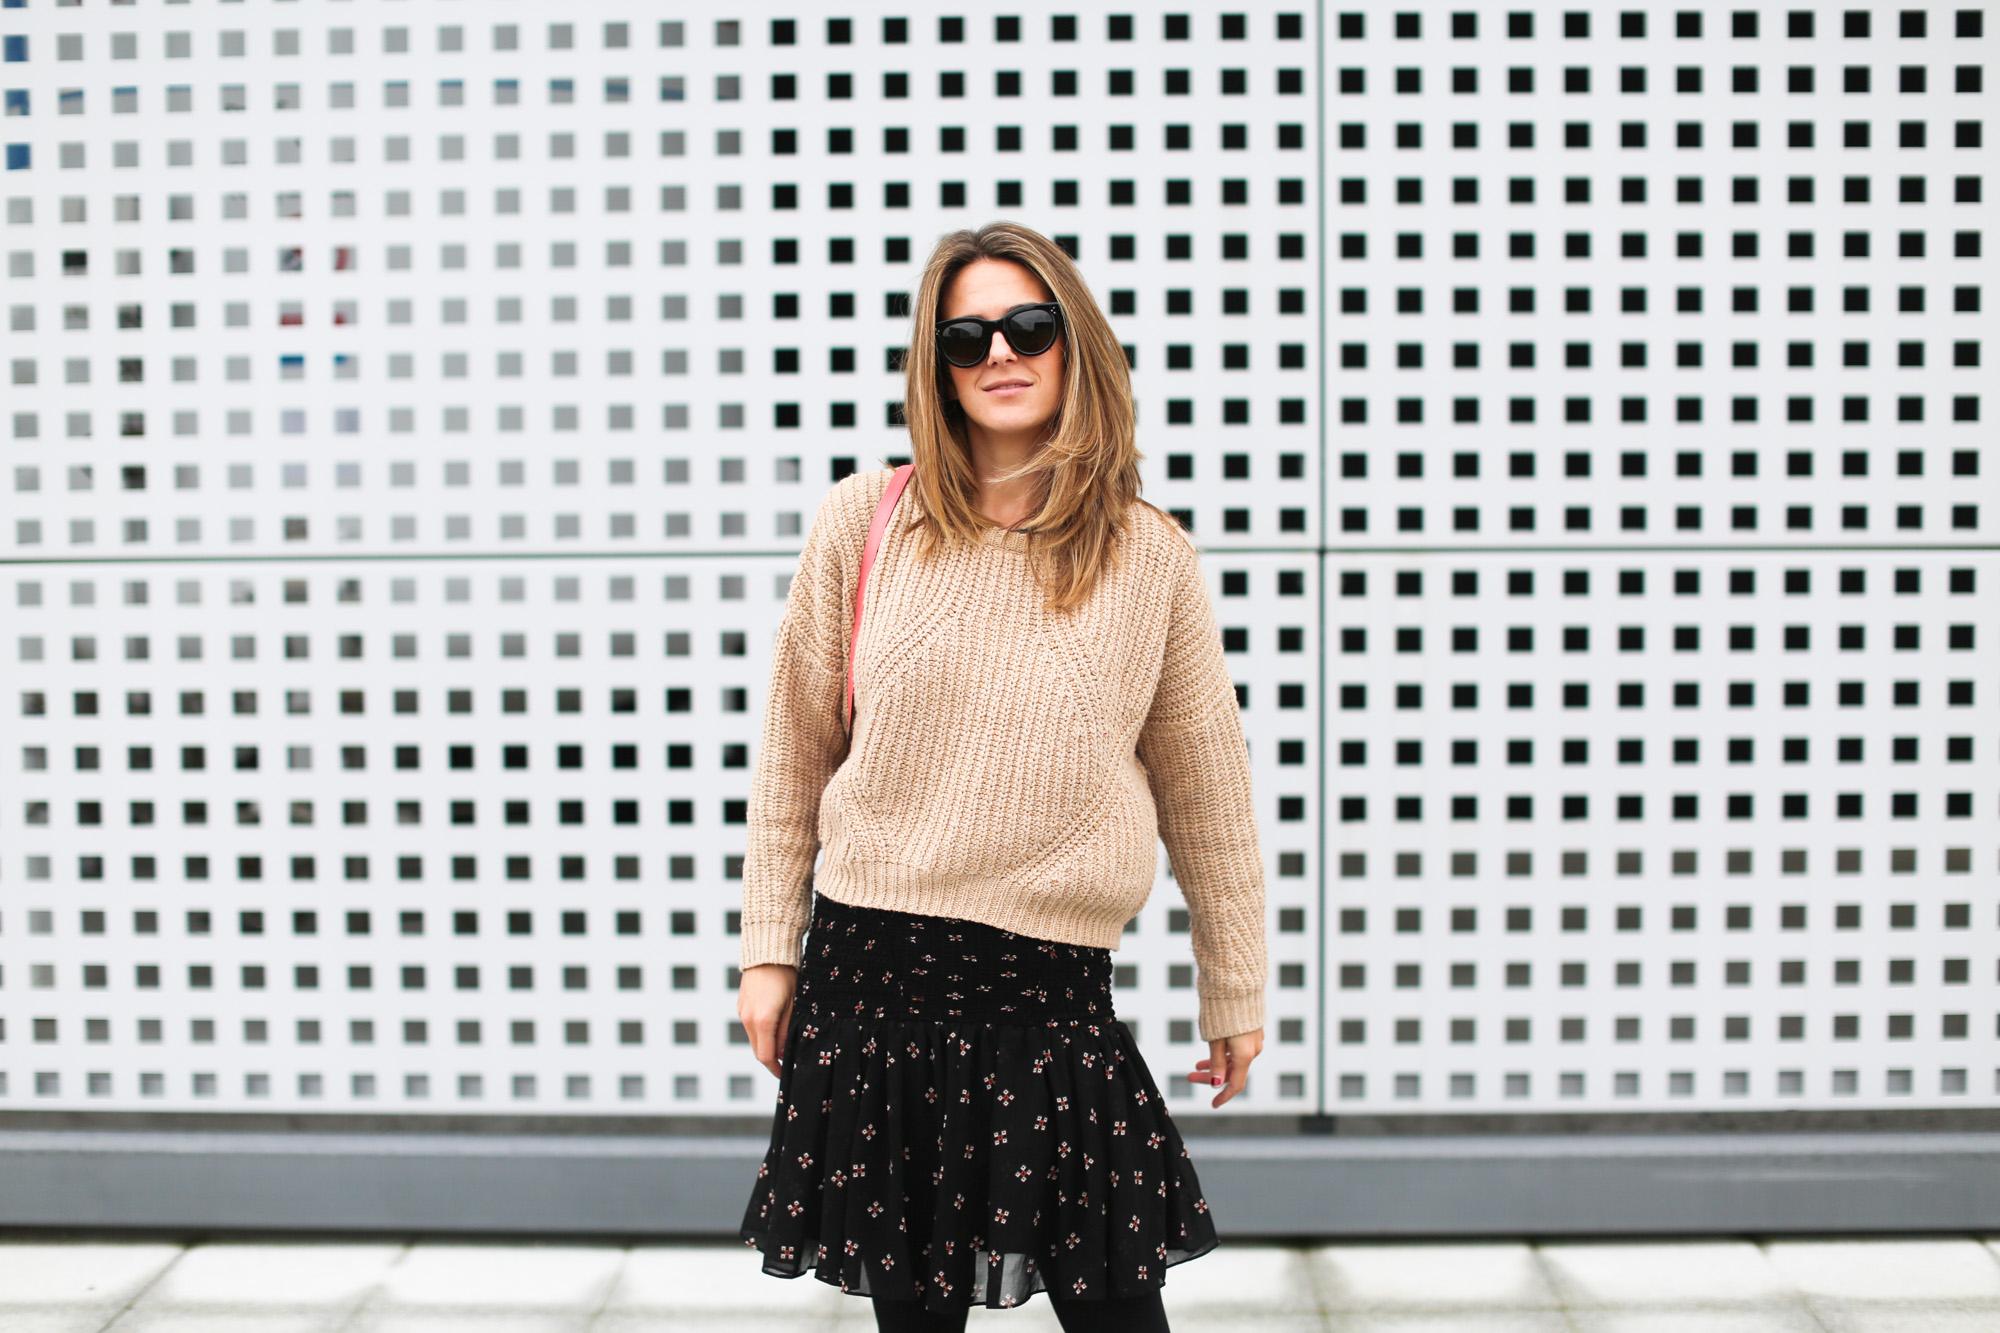 Clochet_streestyle_fashionblogger_minifaldafruncidamaje_botinesdickerIsabelMarant_bolsominiparadisredtitamadrid-5